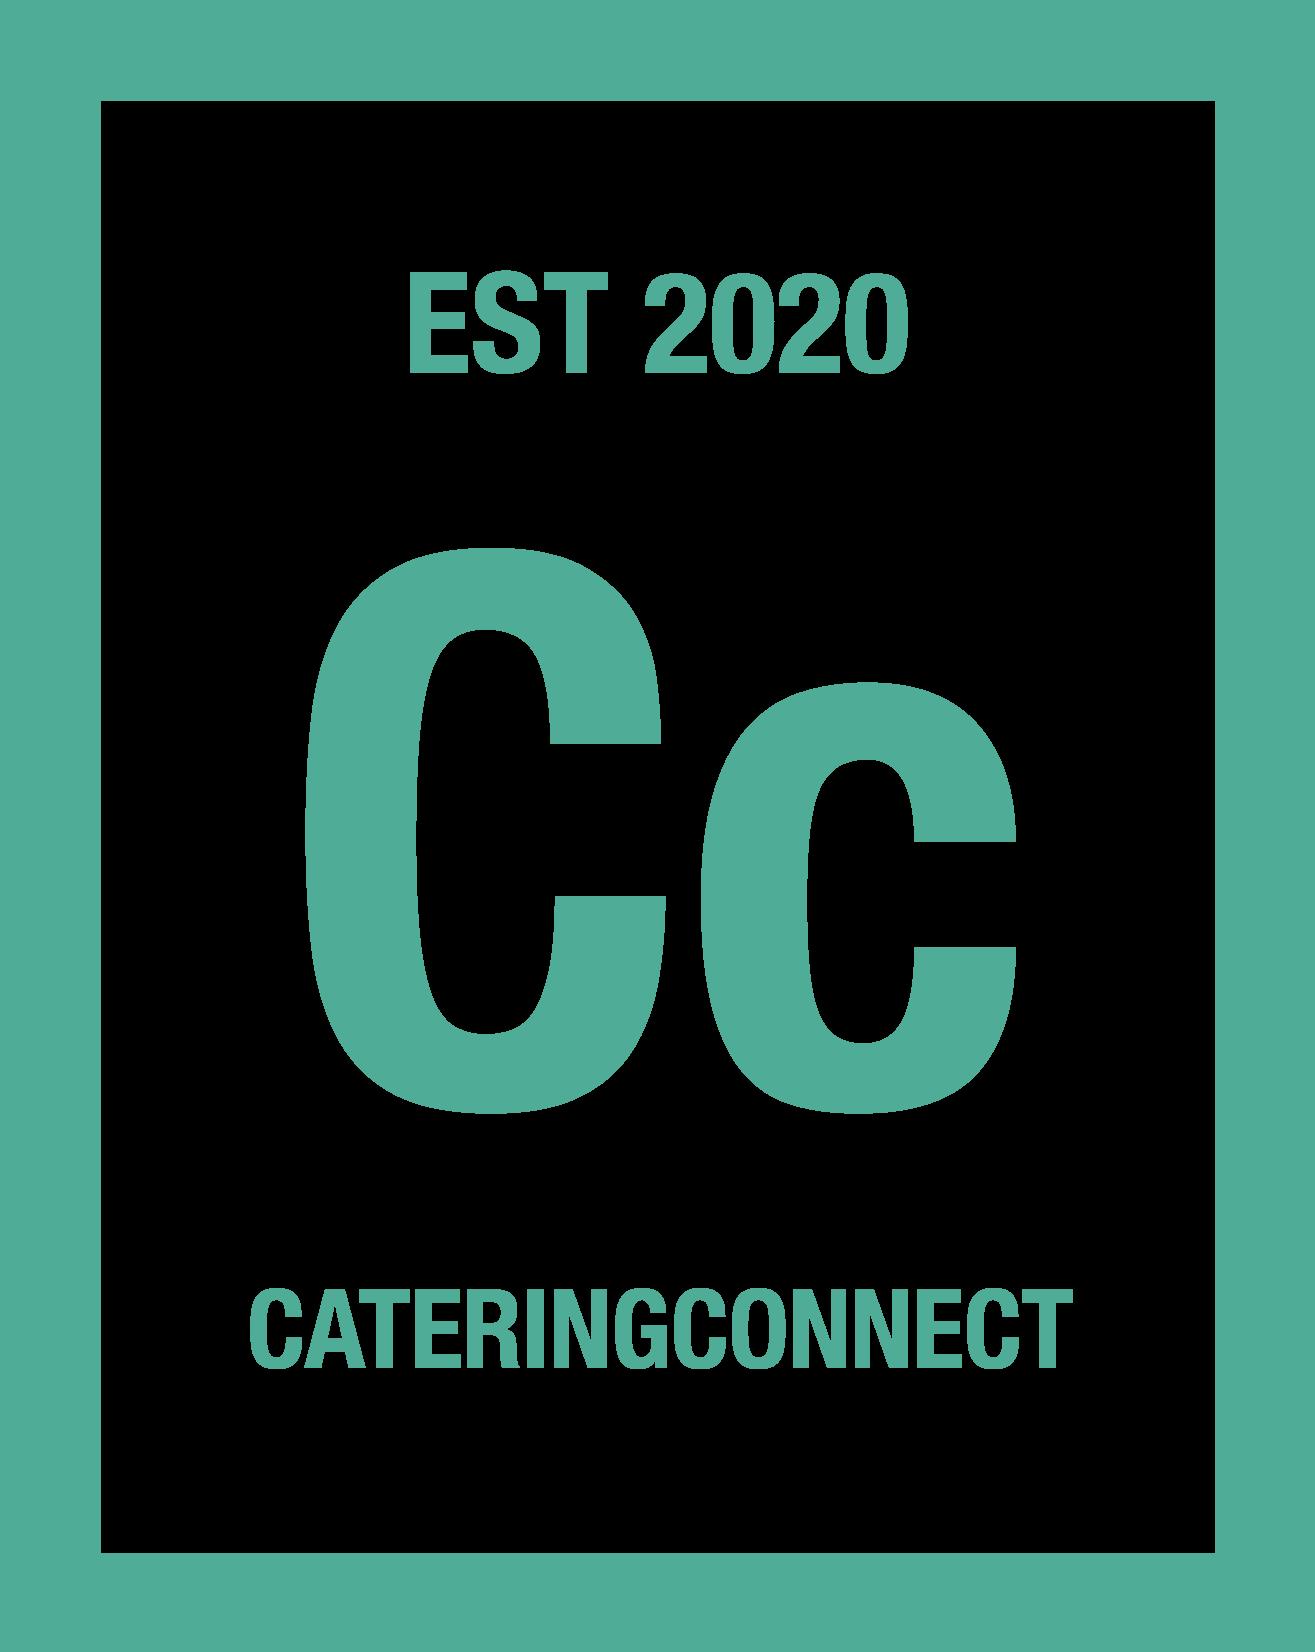 CC_logo-2-green